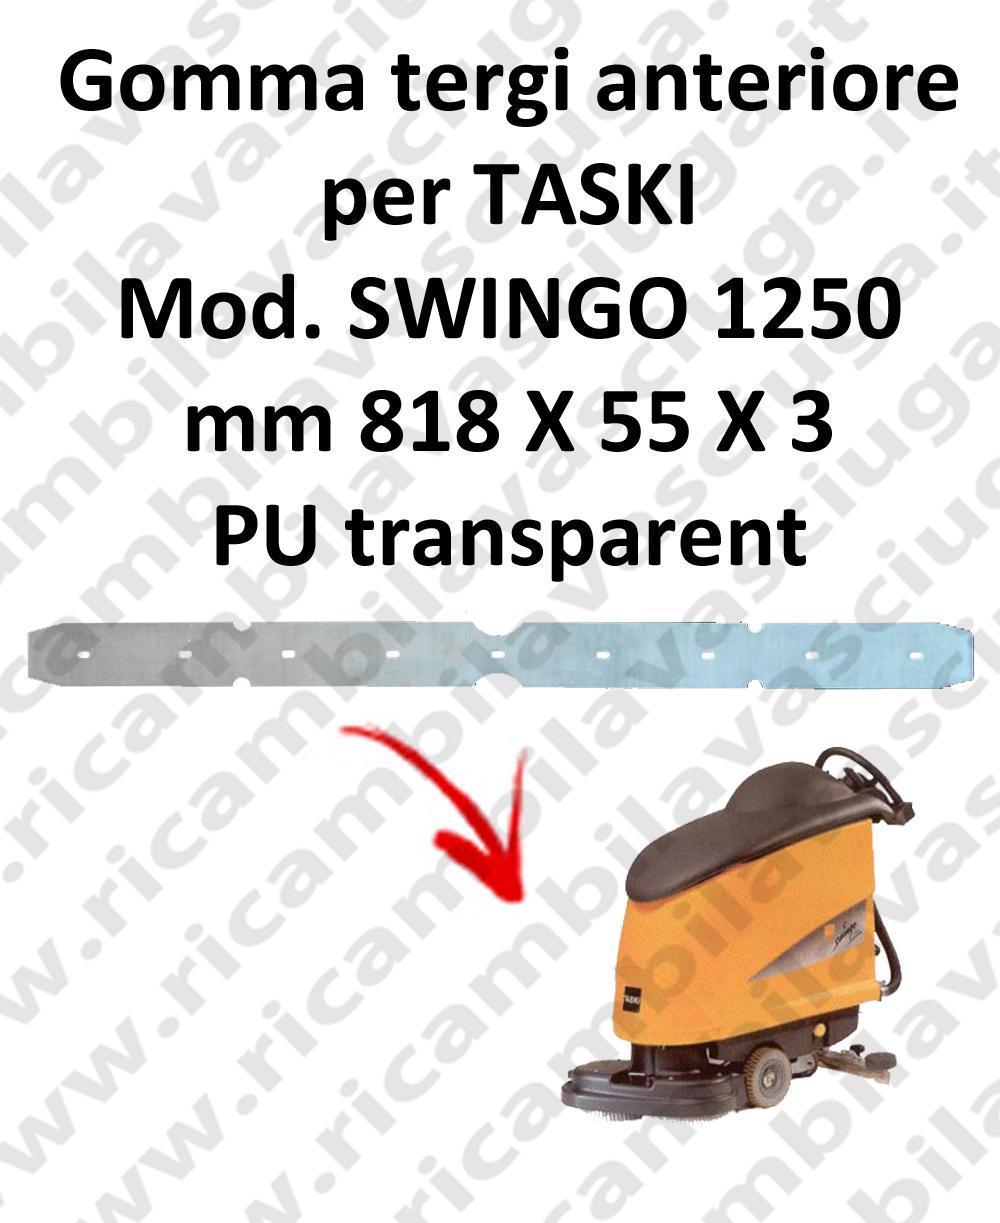 Front Squeegee rubber for scrubber dryer TASKI model SWINGO 1250